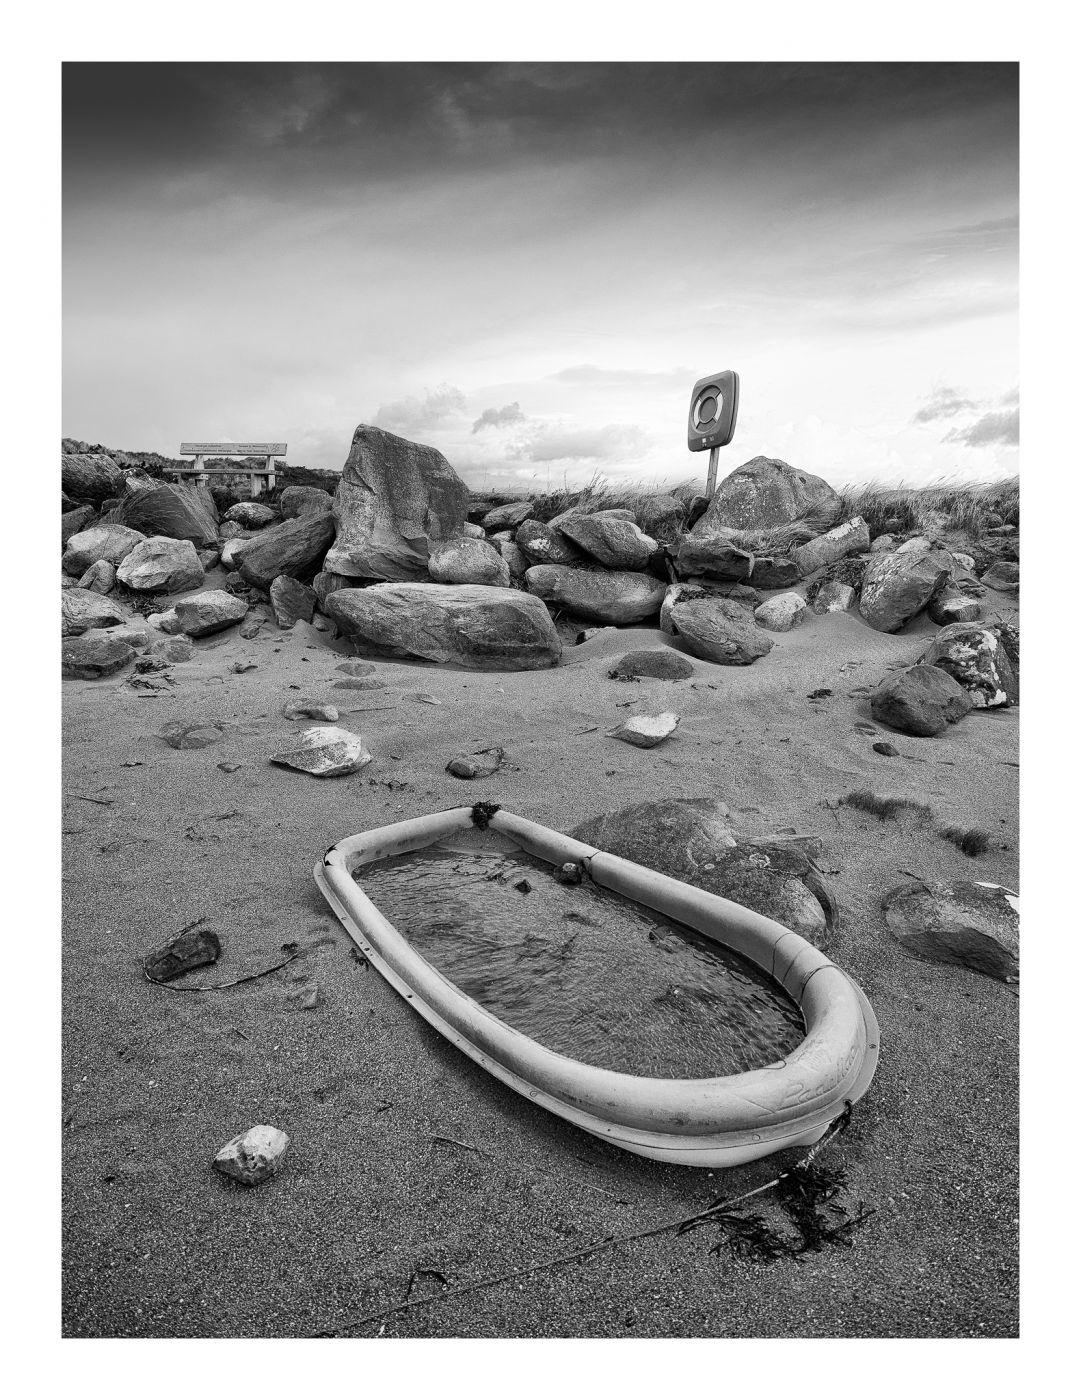 Llandanwg Estuary, United Kingdom